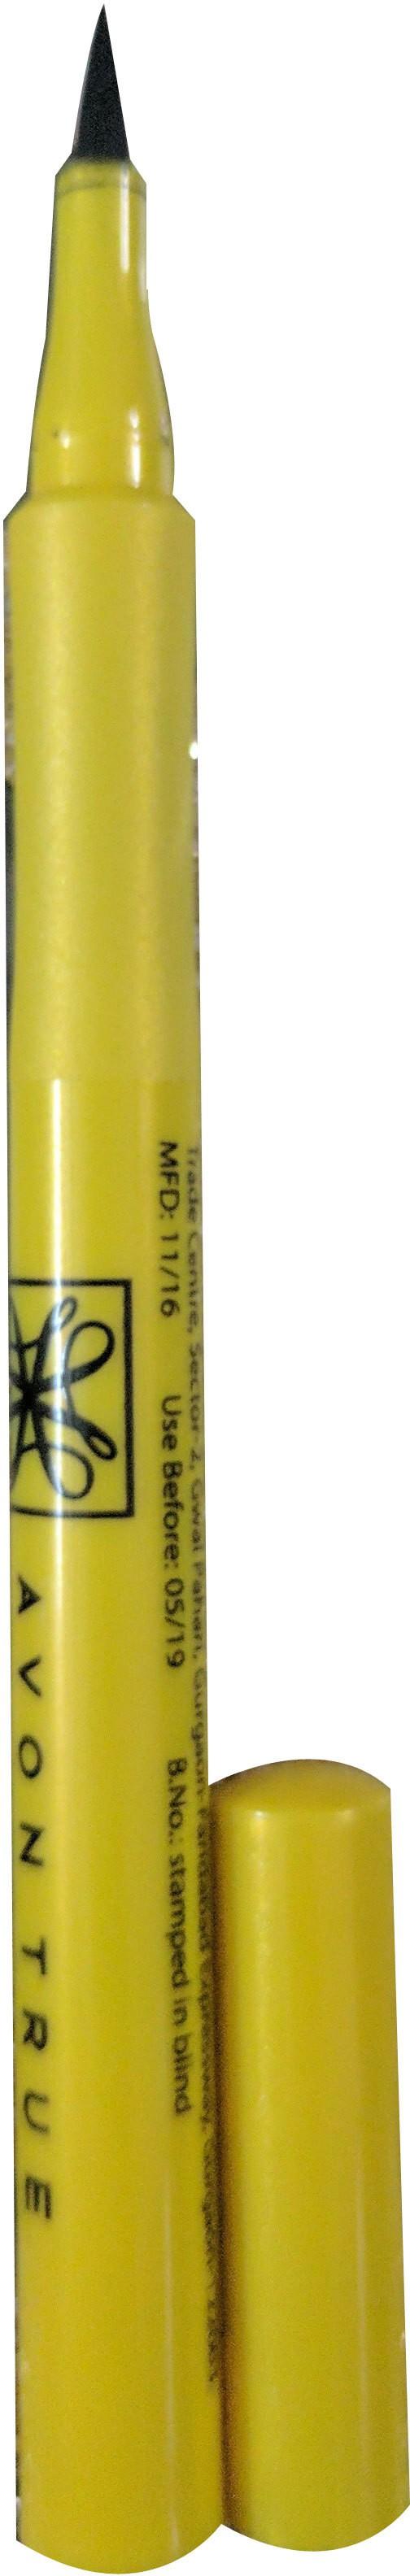 Avon True Color Super Extend Extreme Eye liner 1 ml(Black)